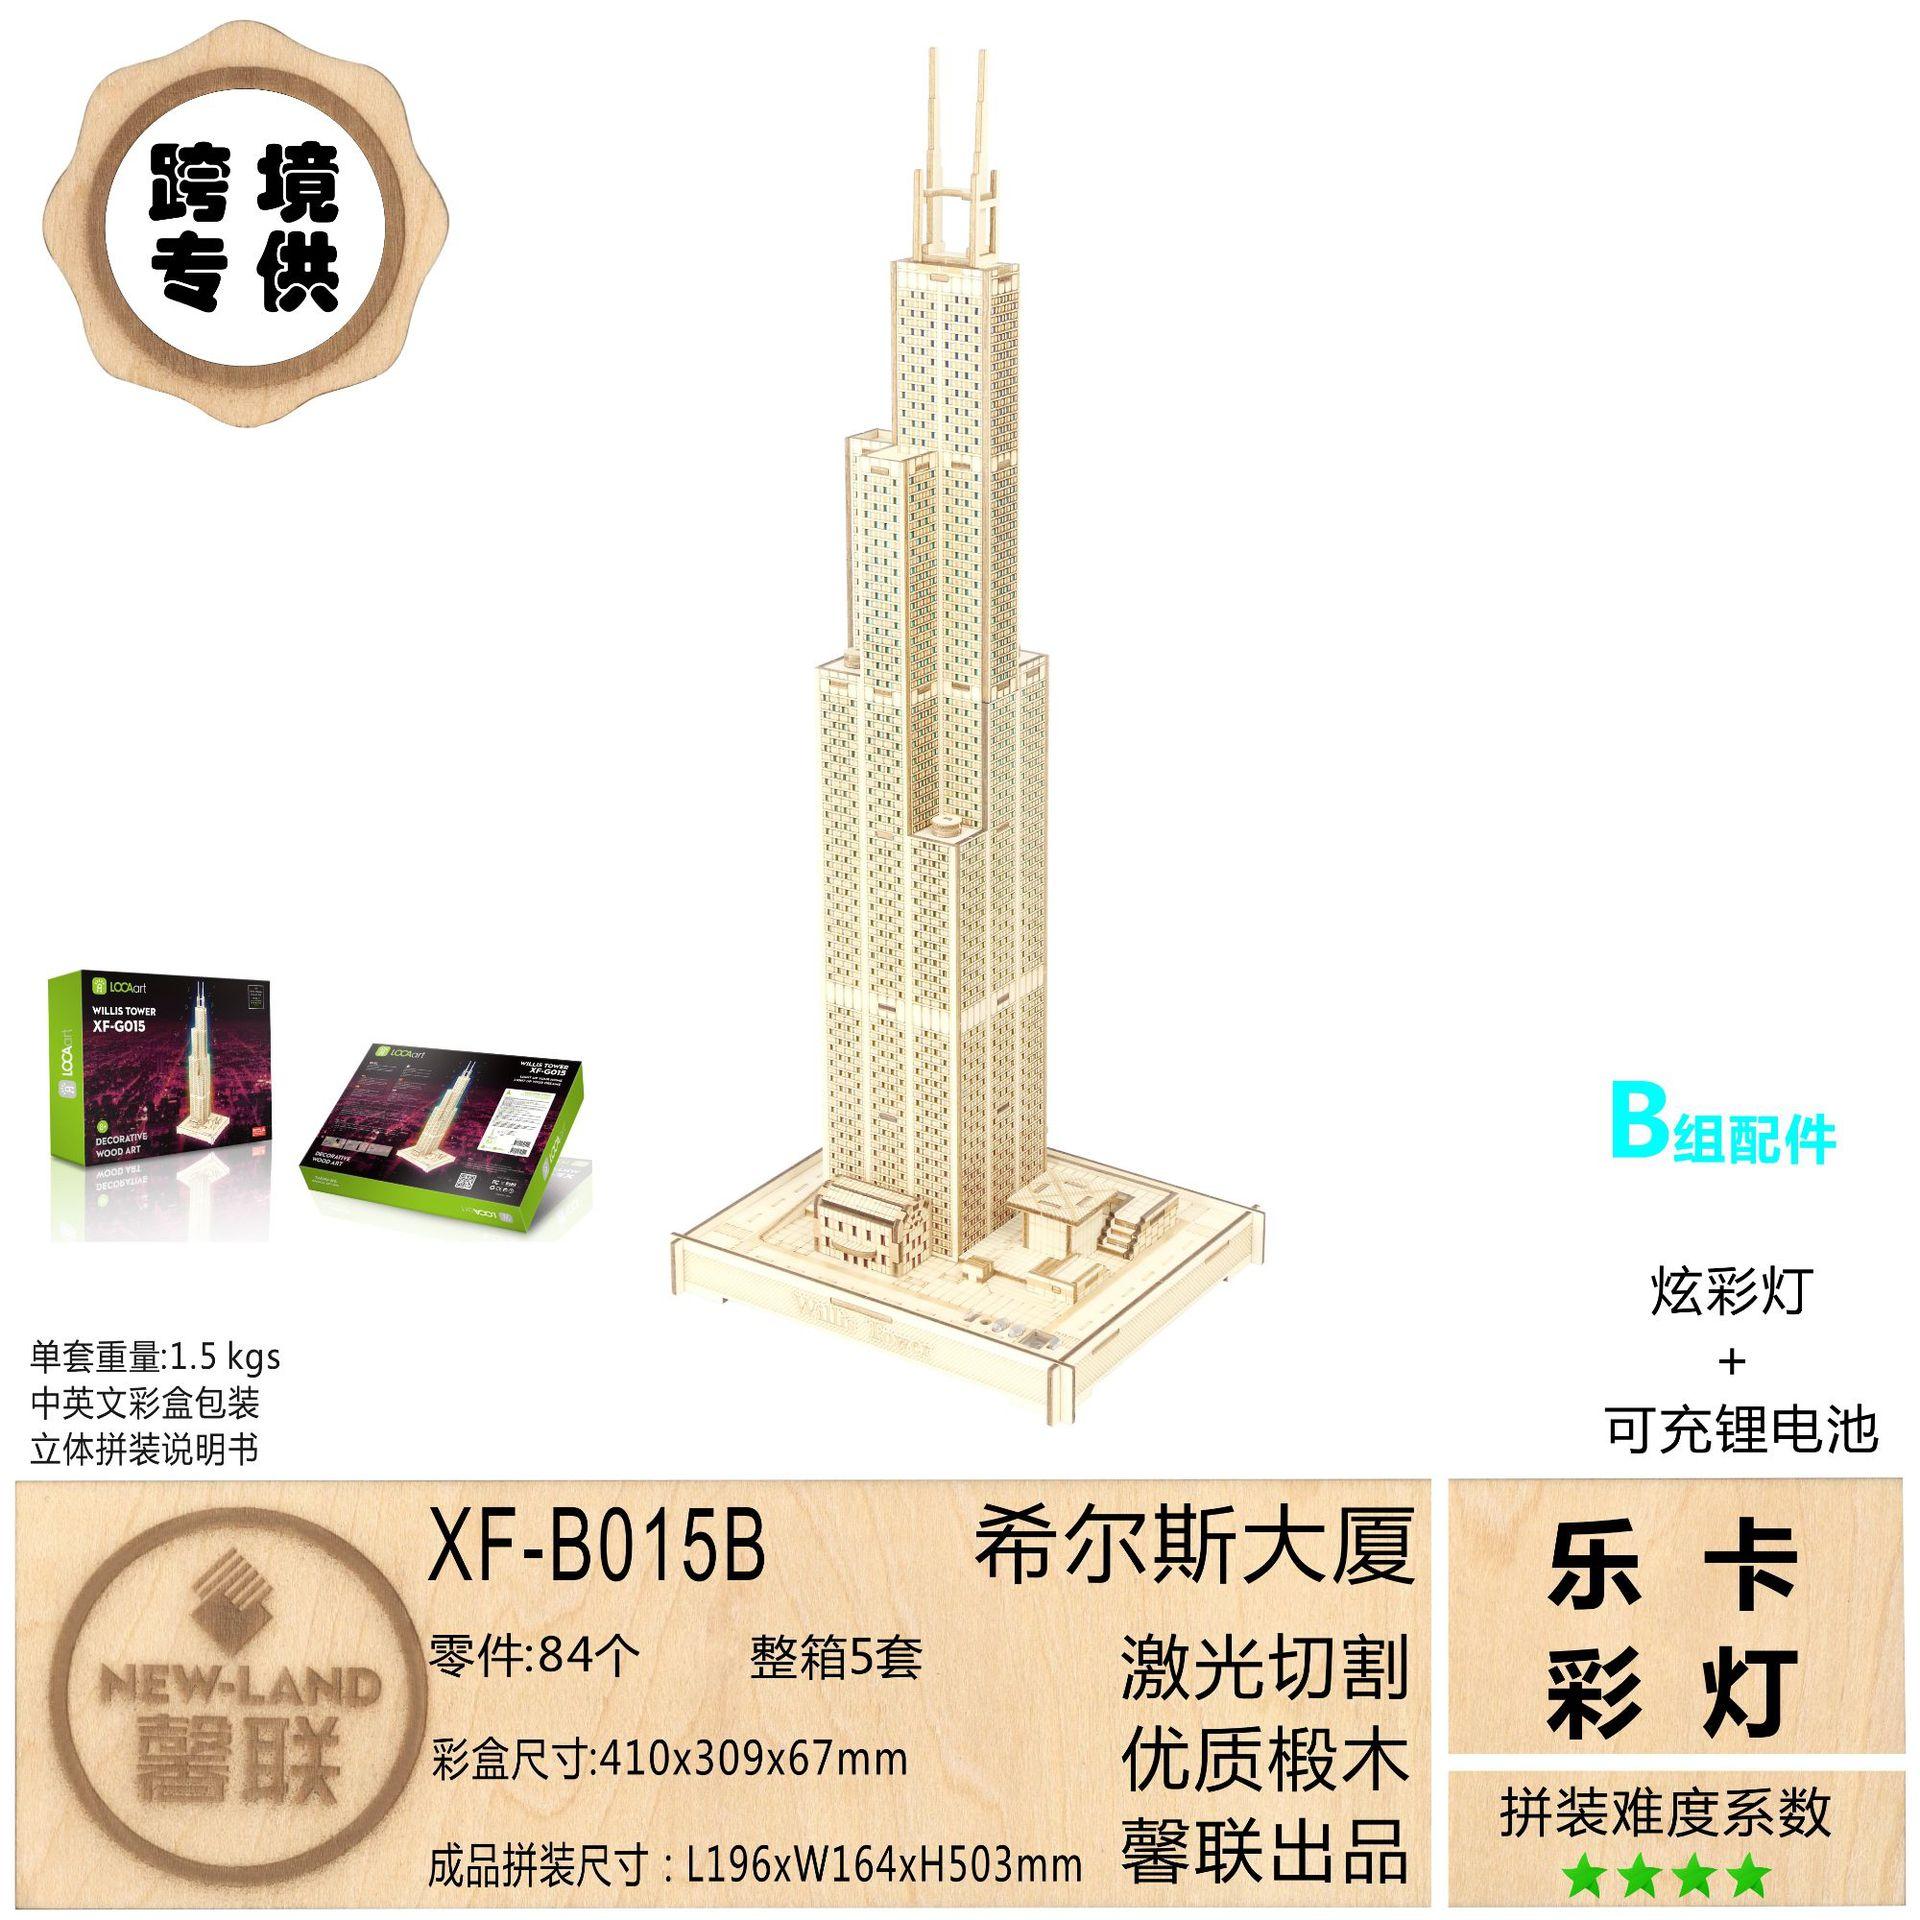 XF-G015B 西尔斯大厦